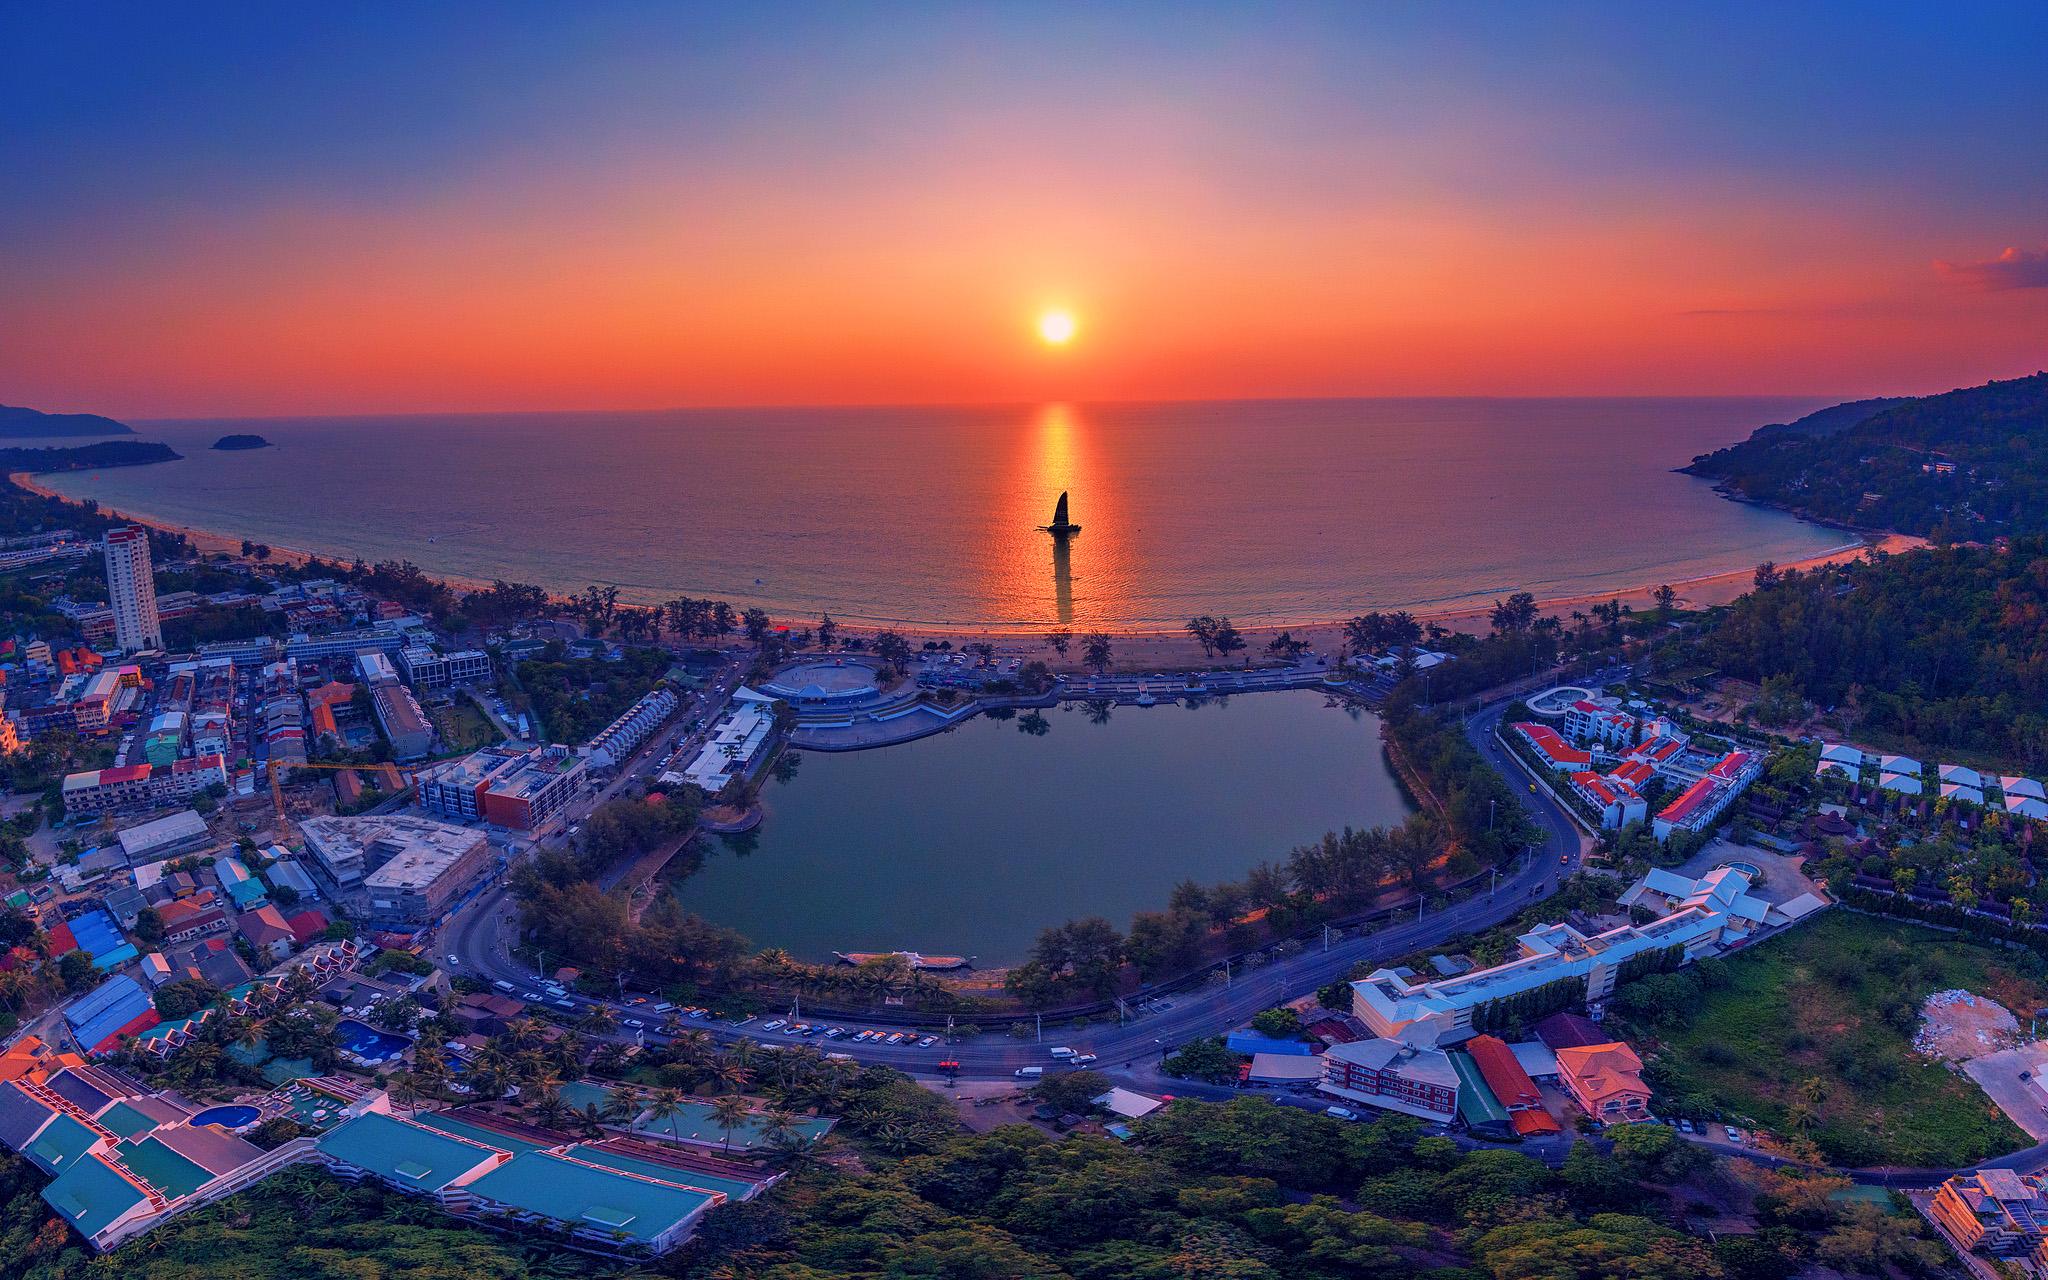 Sunset sailing, Karon beach, Phuket by Mike Leung.jpg